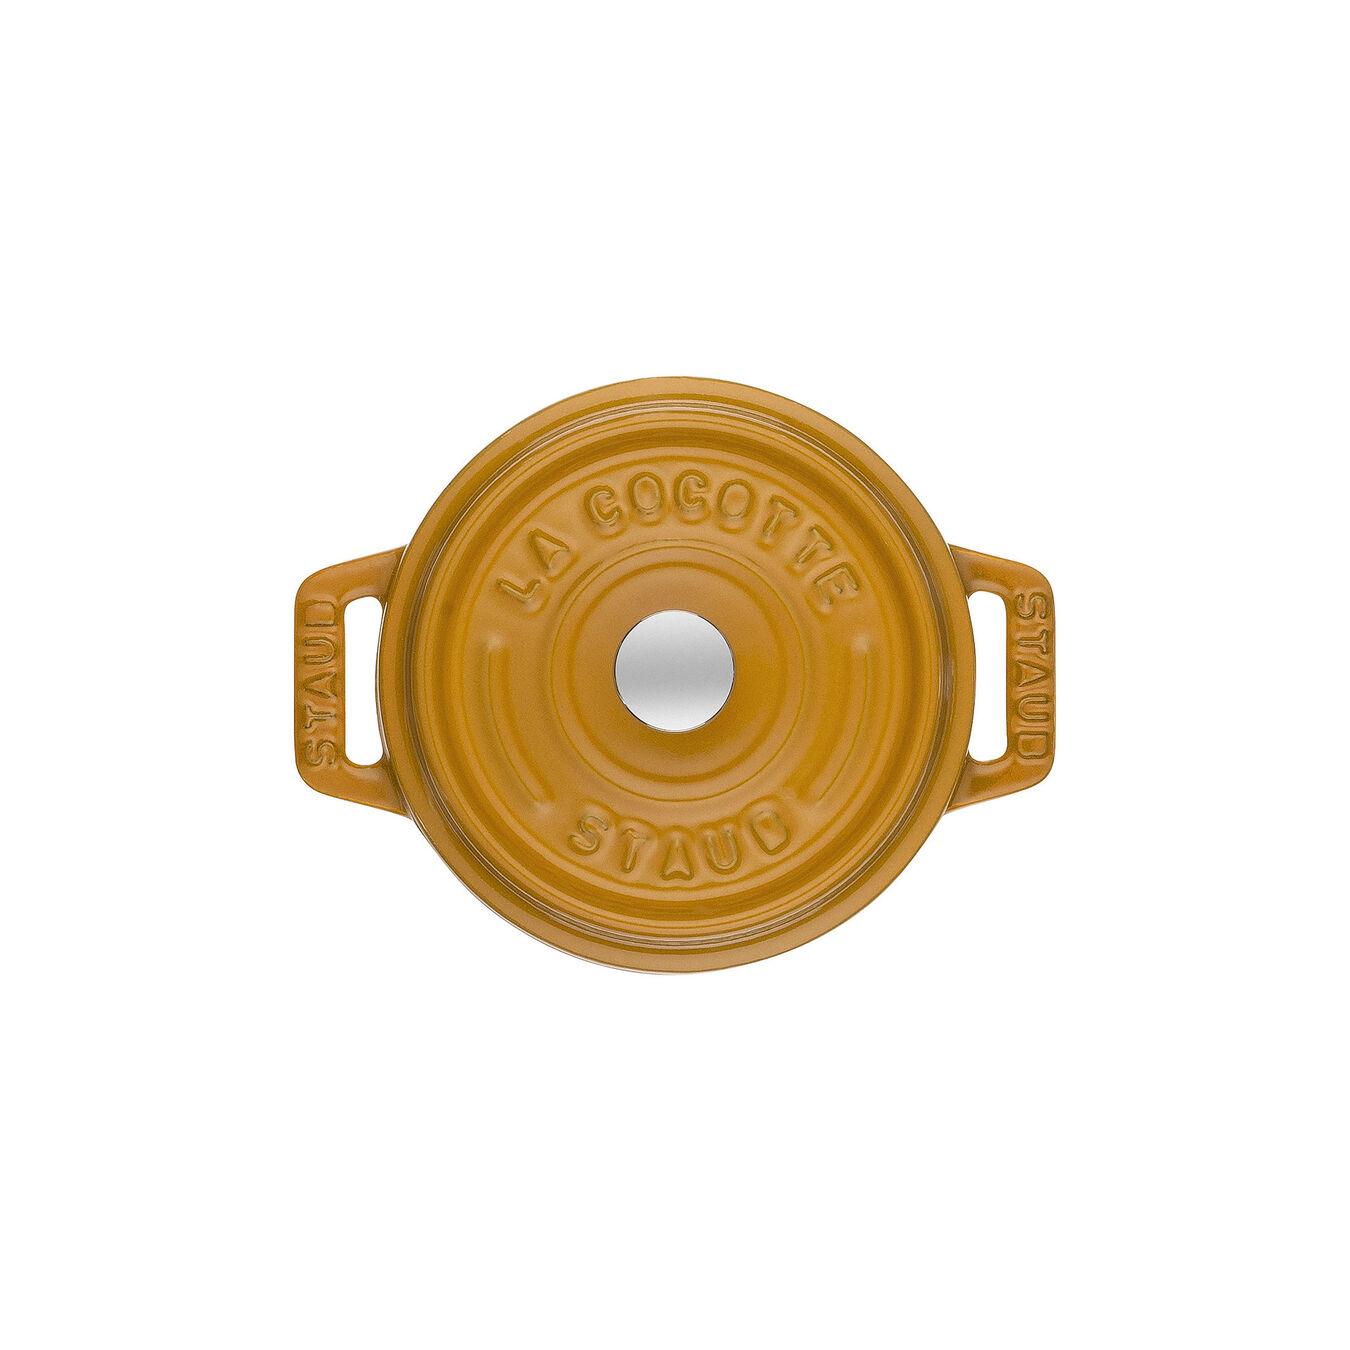 Mini Cocotte 10 cm, rund, Senf, Gusseisen,,large 2